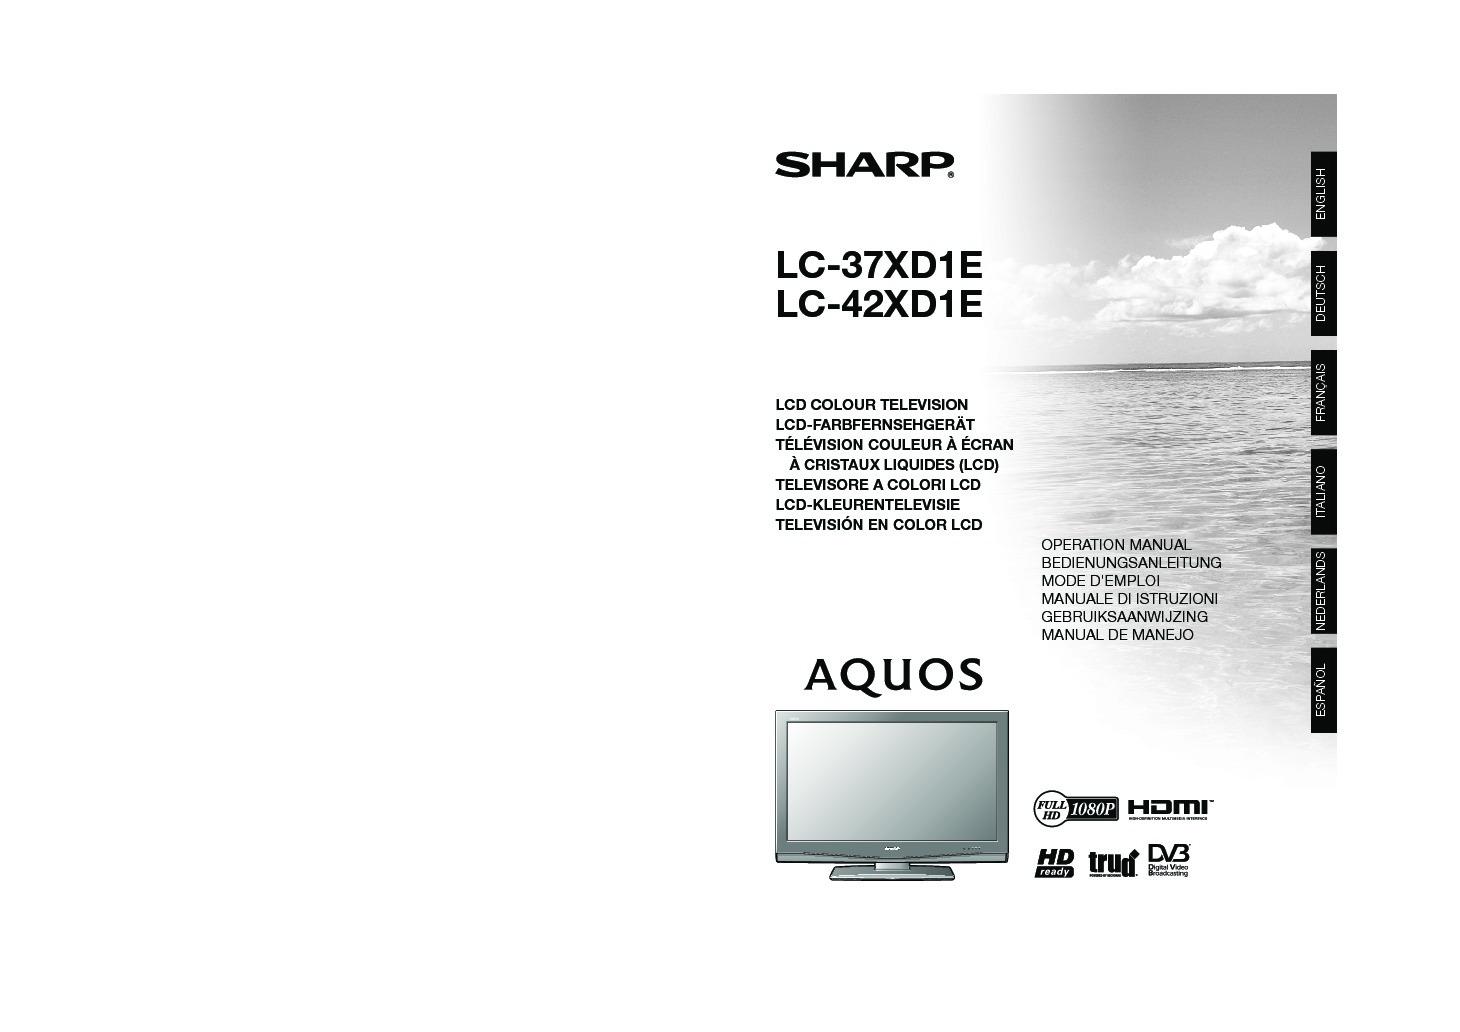 Sharp LC-37XD1E (SERV MAN10) User Guide / Operation Manual